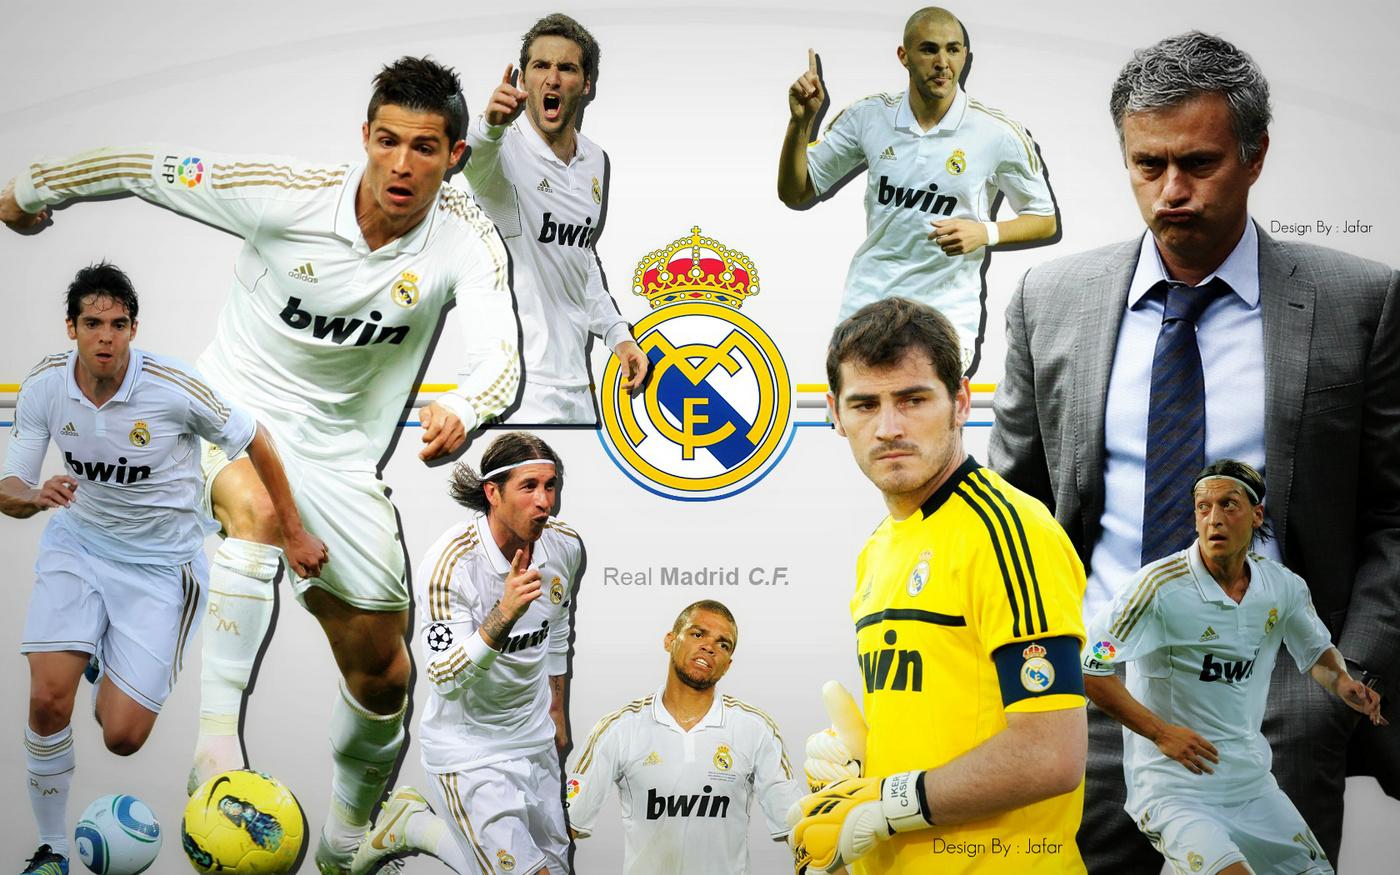 http://2.bp.blogspot.com/-7aQF5m1Efq0/UFUB0MW2aMI/AAAAAAAACGA/DM-YC0FmDao/s1600/Real+Madrid+Soccer+Wallpaper+2012-2013+15.jpg